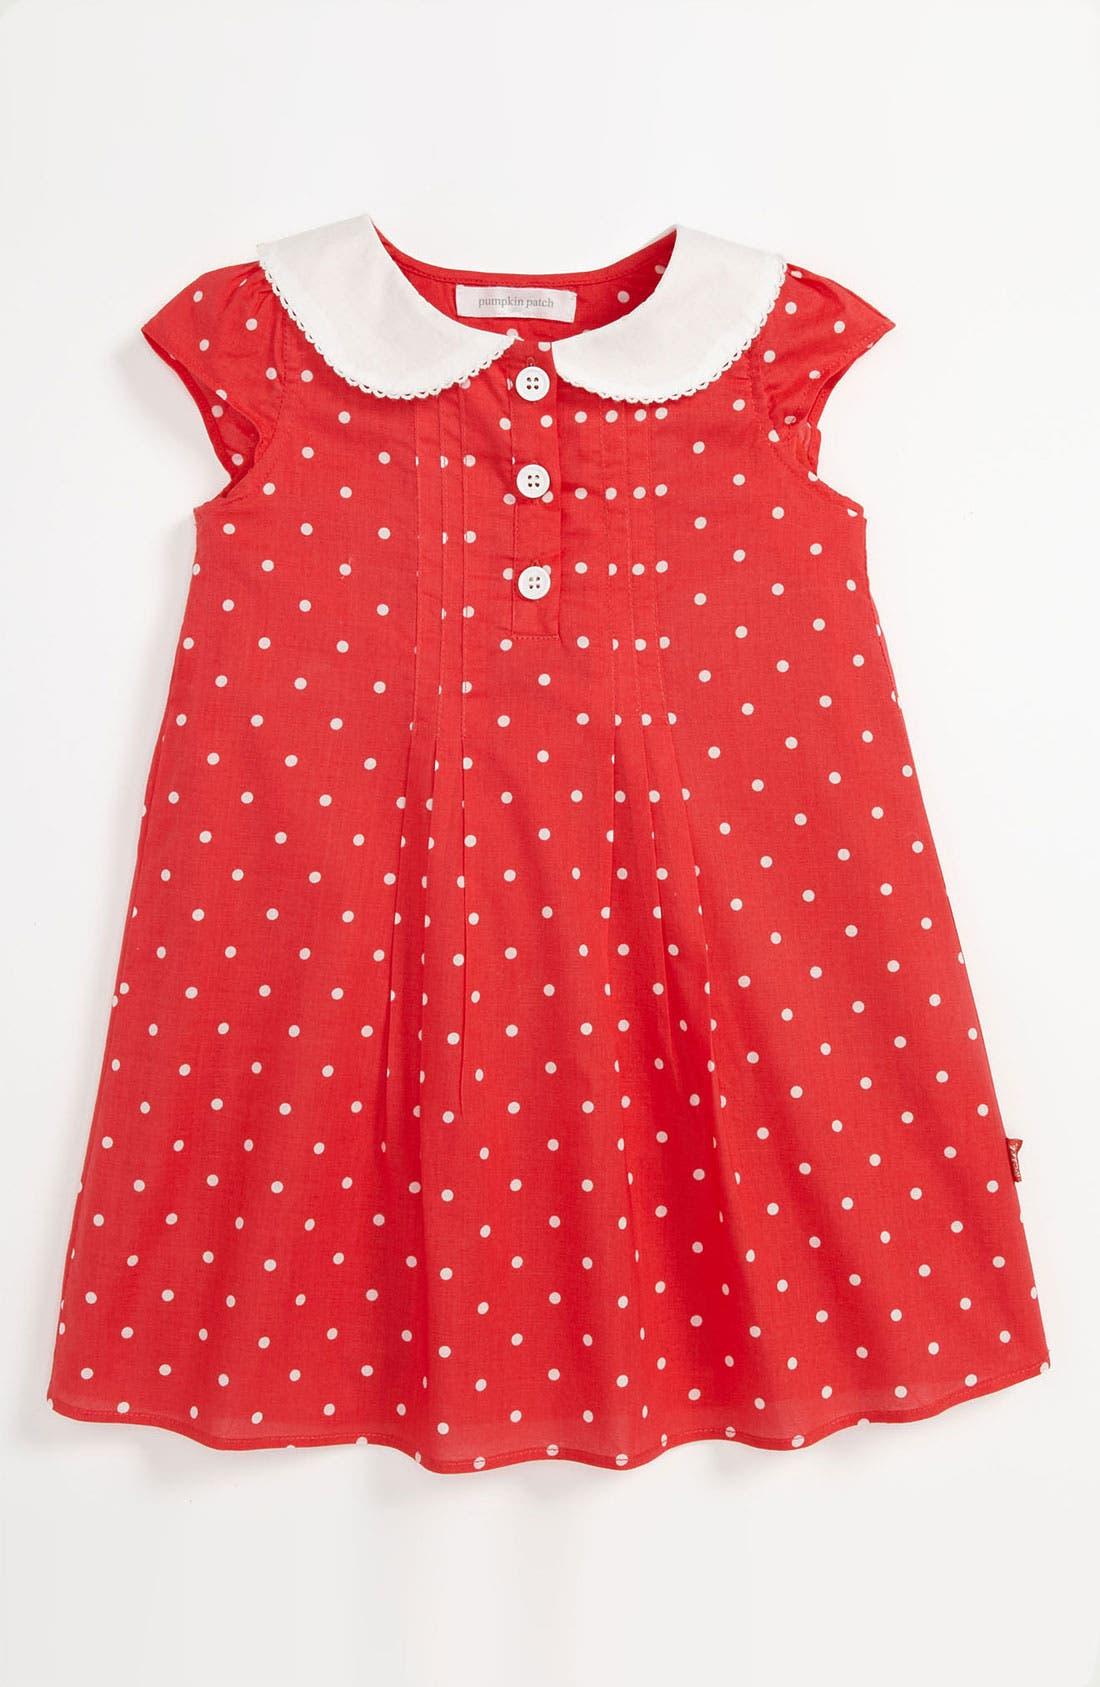 Main Image - Pumpkin Patch 'Alexa' Dress (Toddler)